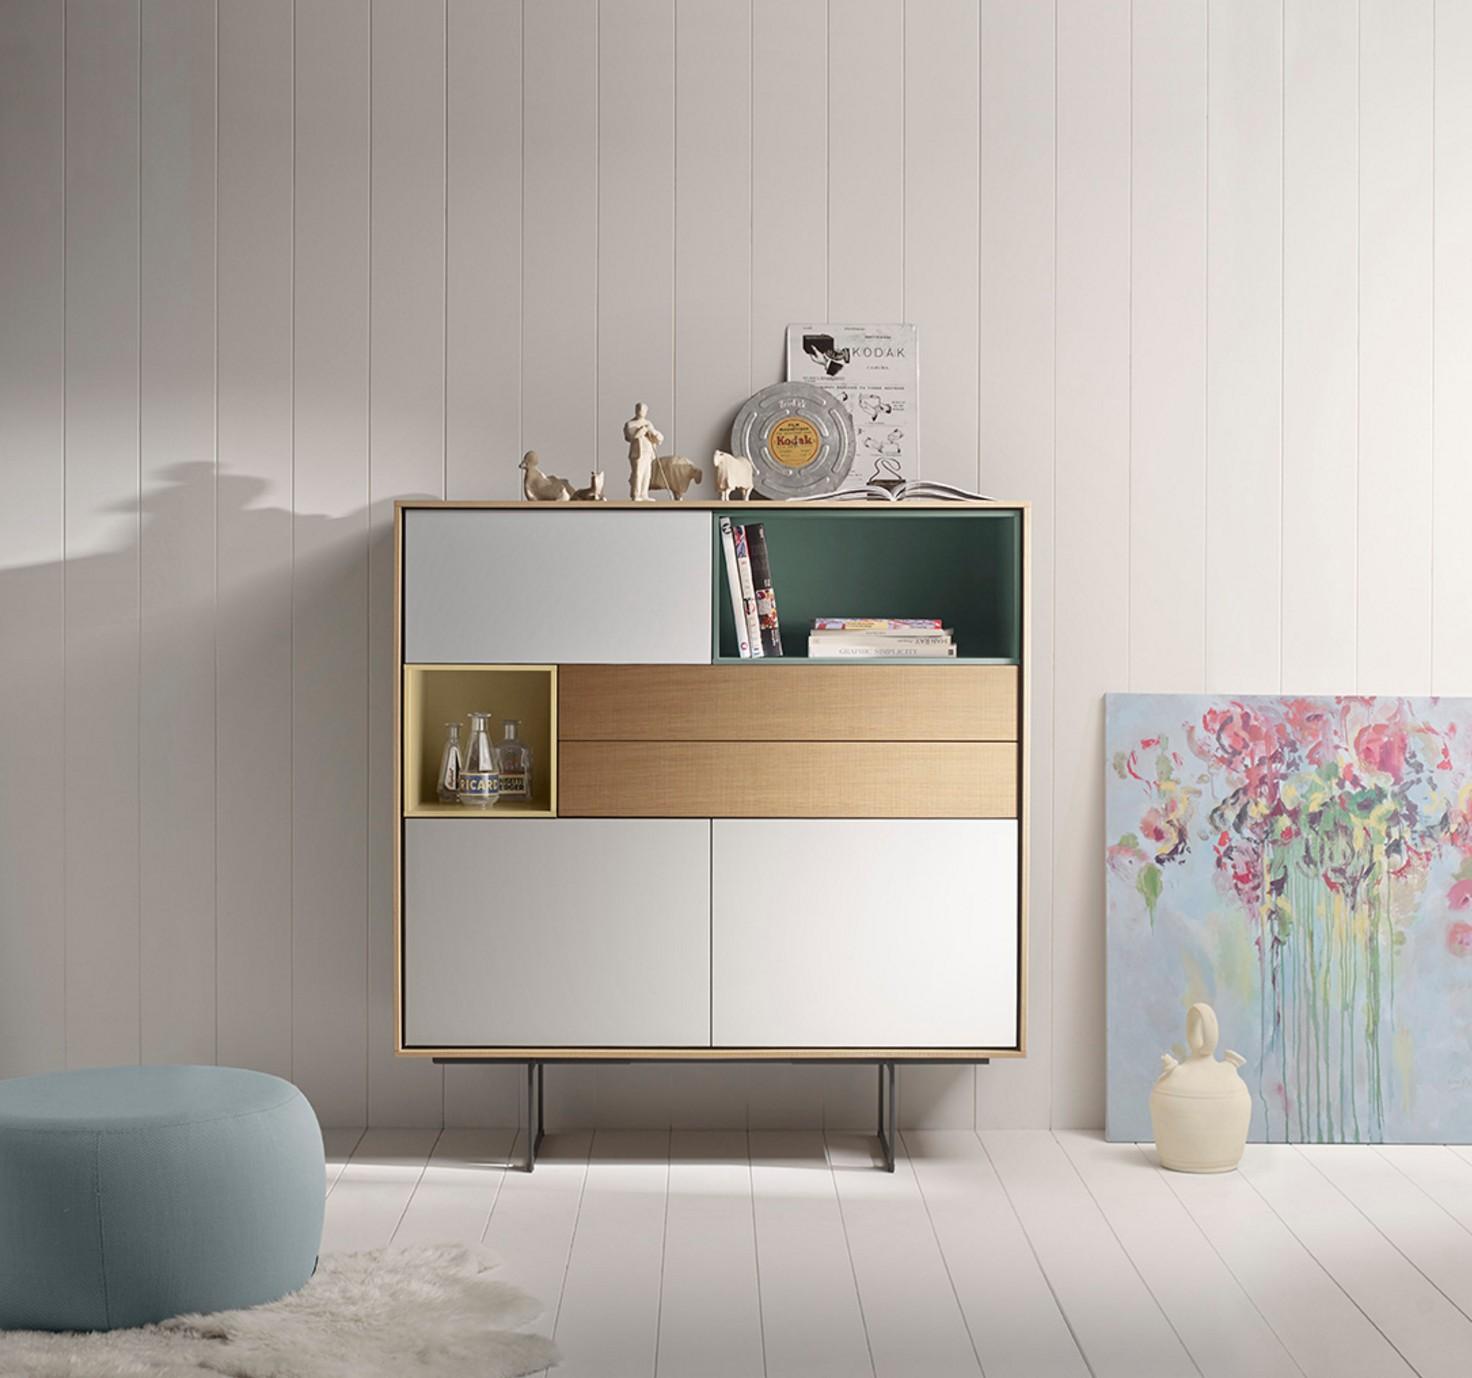 meubles aura par treku blog d co design. Black Bedroom Furniture Sets. Home Design Ideas